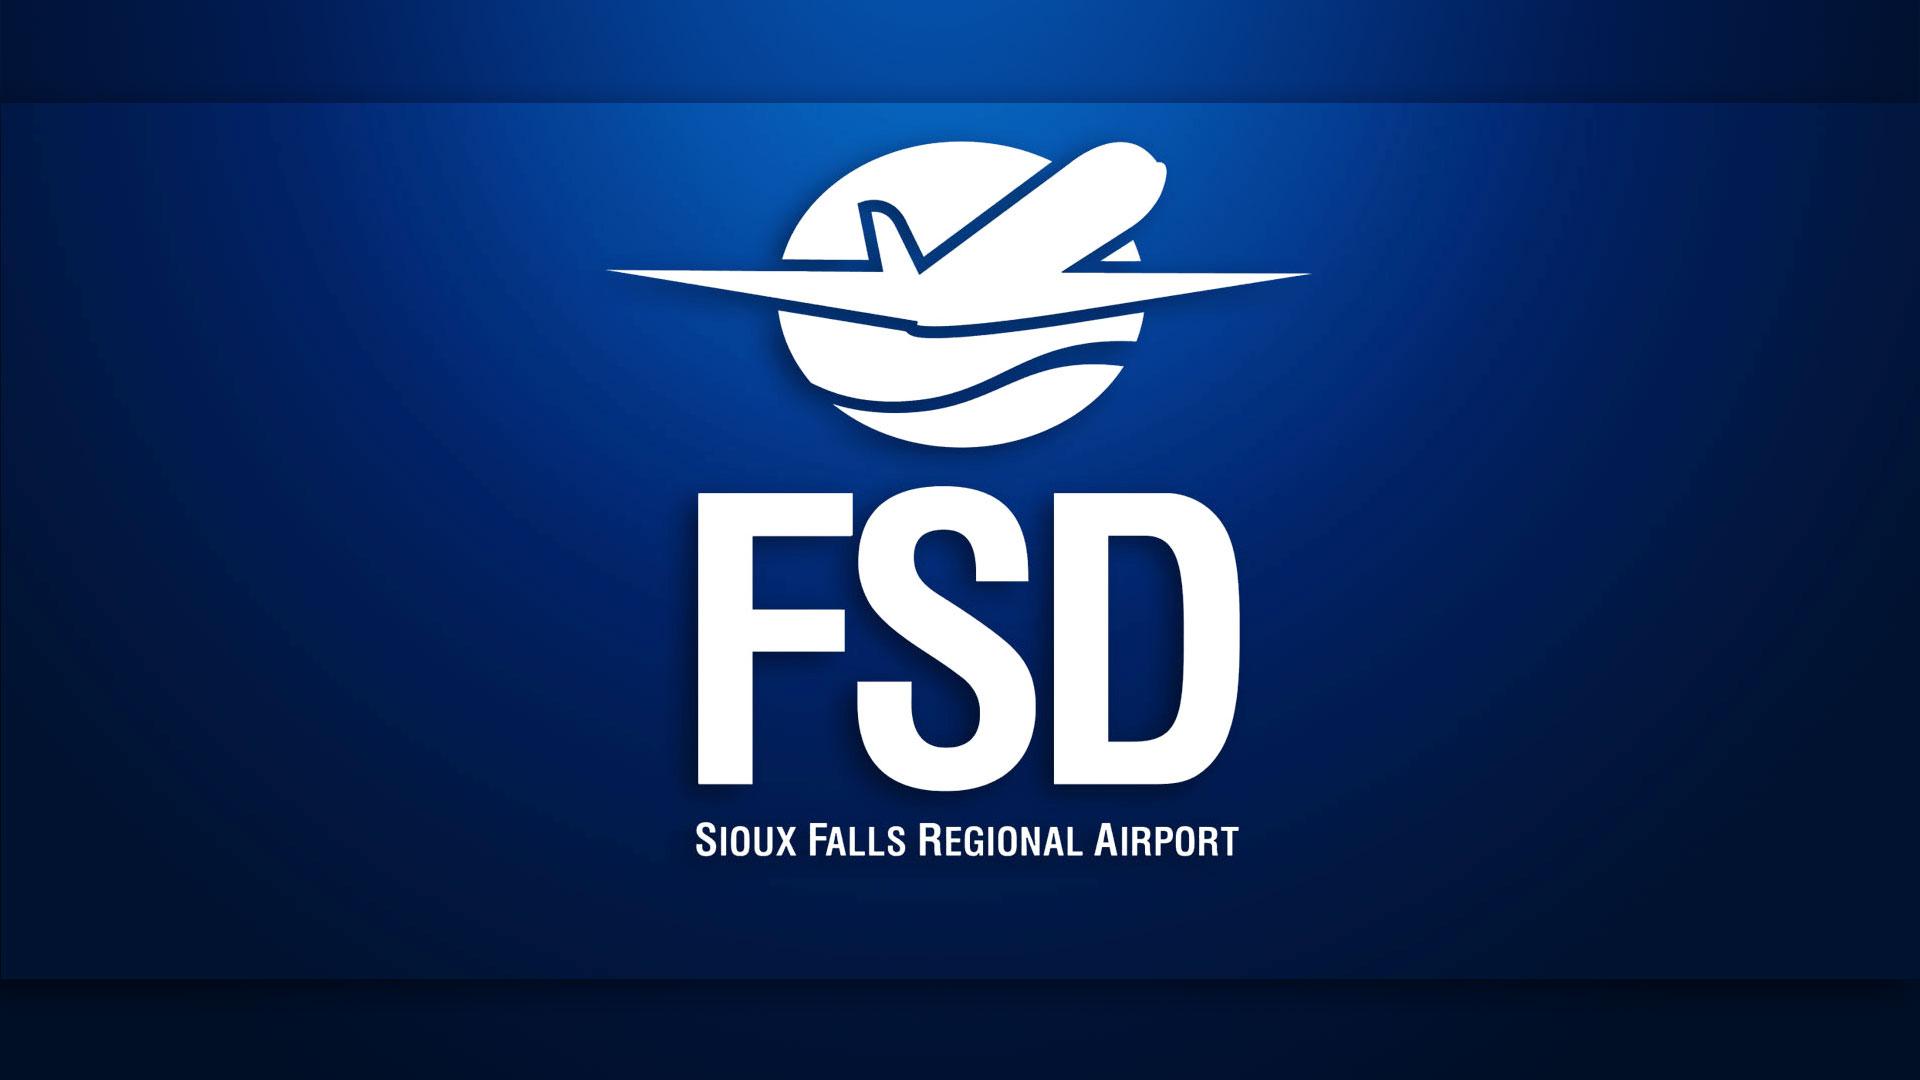 KELO Sioux Falls Regional Airport